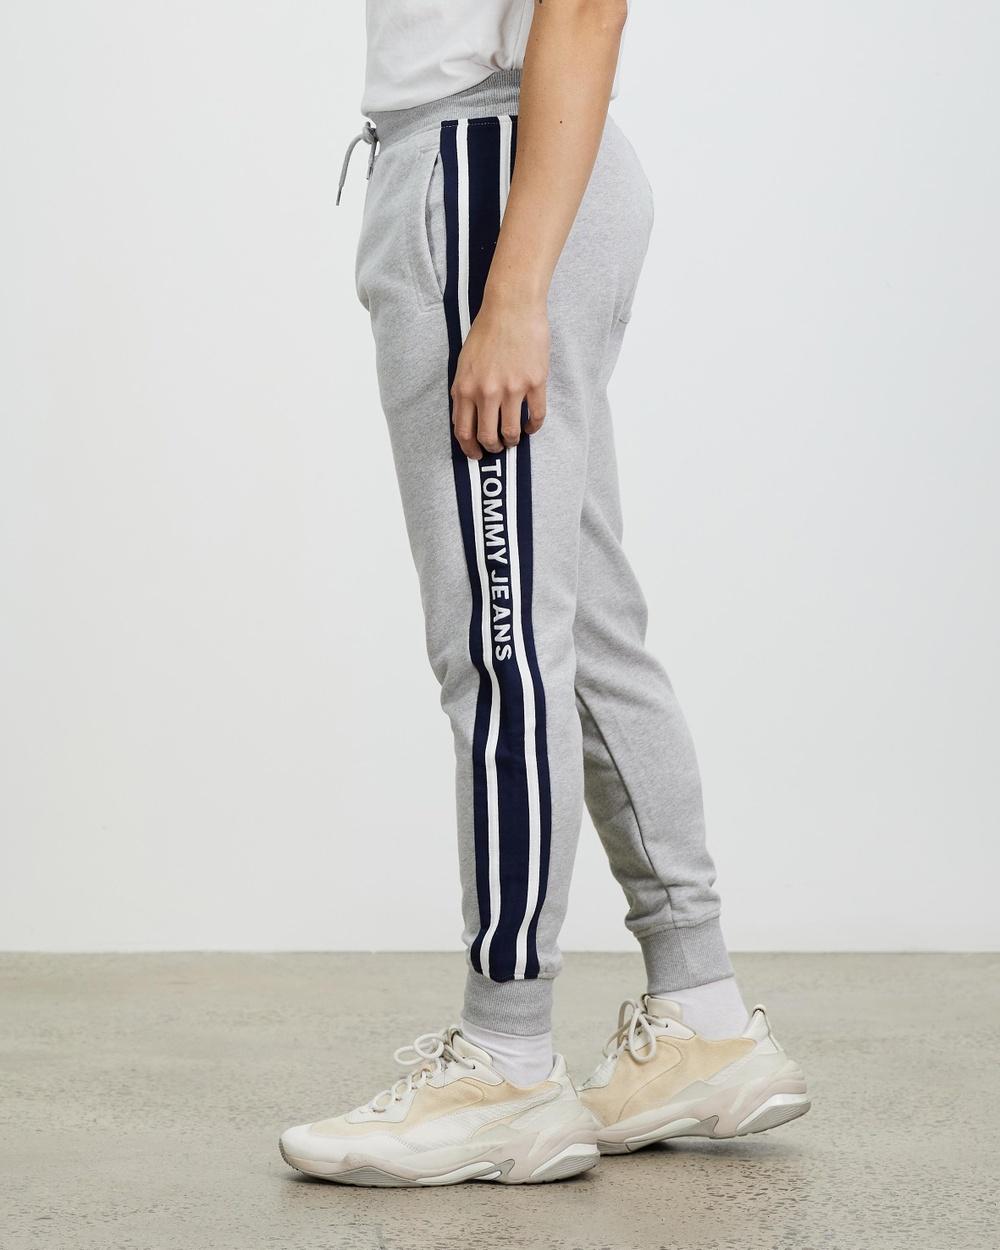 Tommy Jeans Organic Cotton Slim Fit Stripe Joggers Sweatpants Light Grey Heather Australia